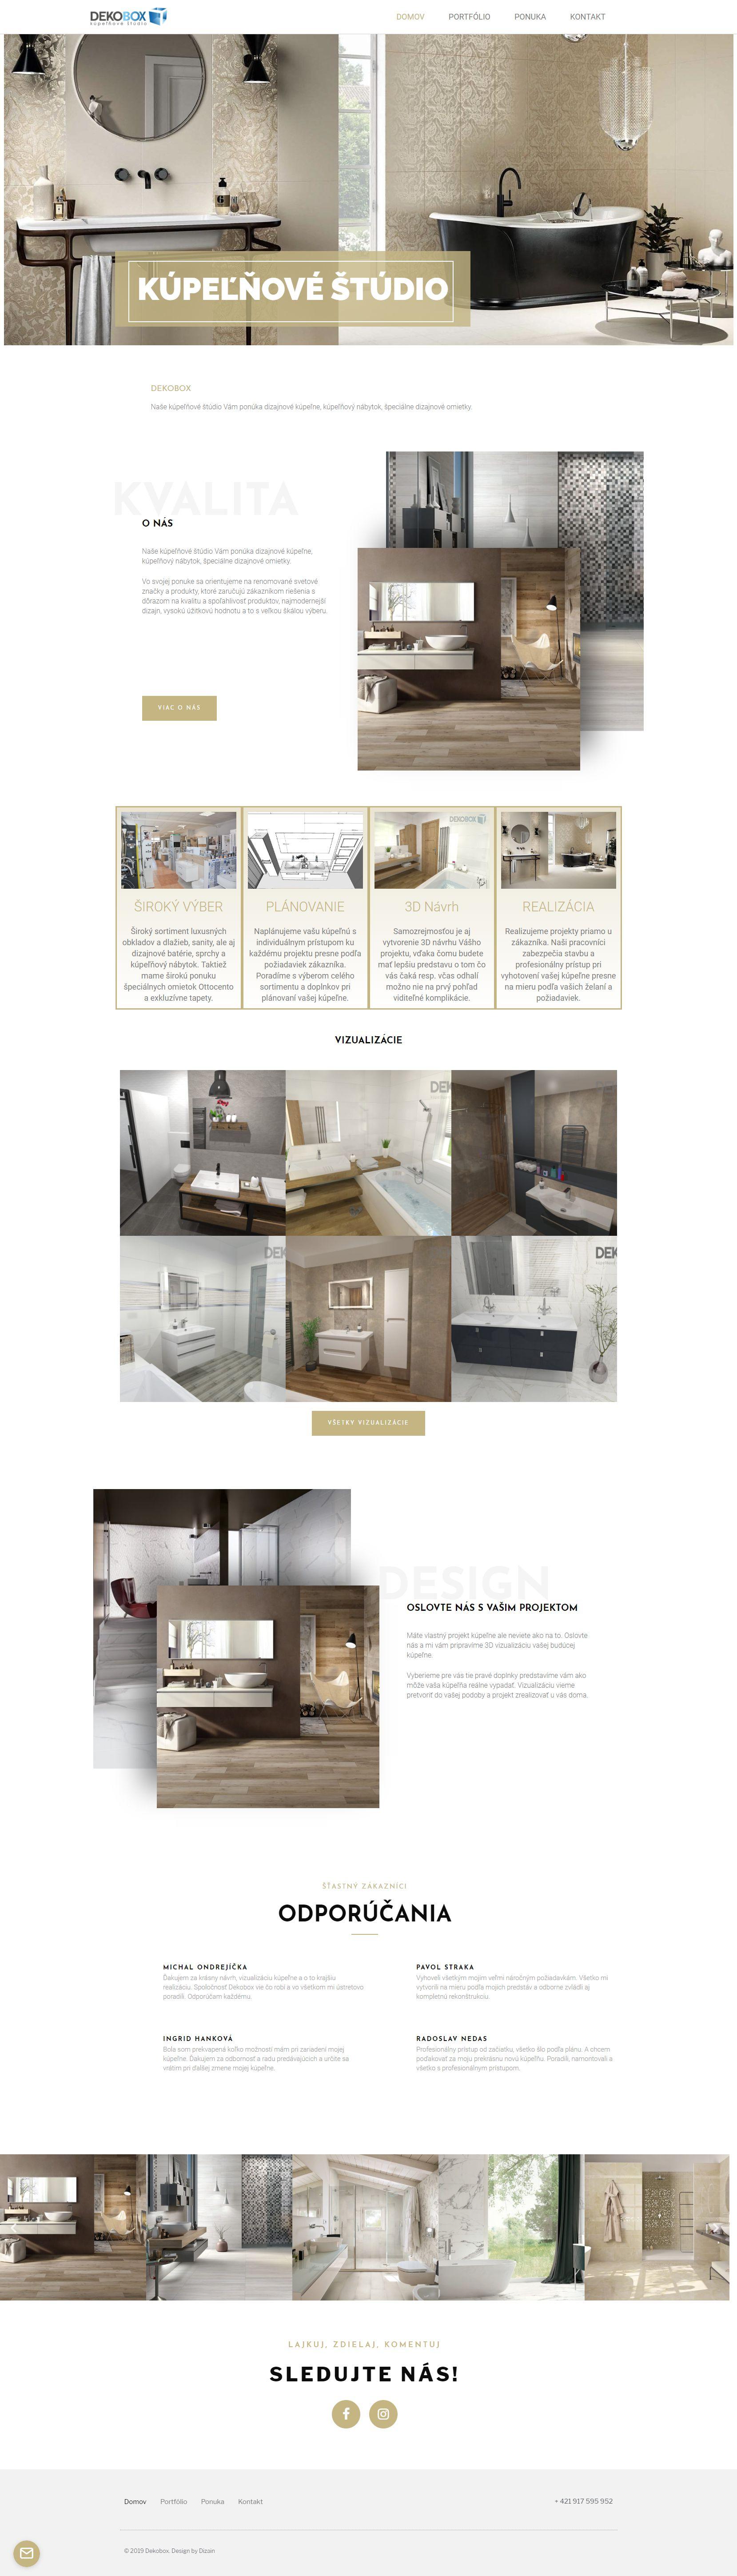 dekobox internetová stránka